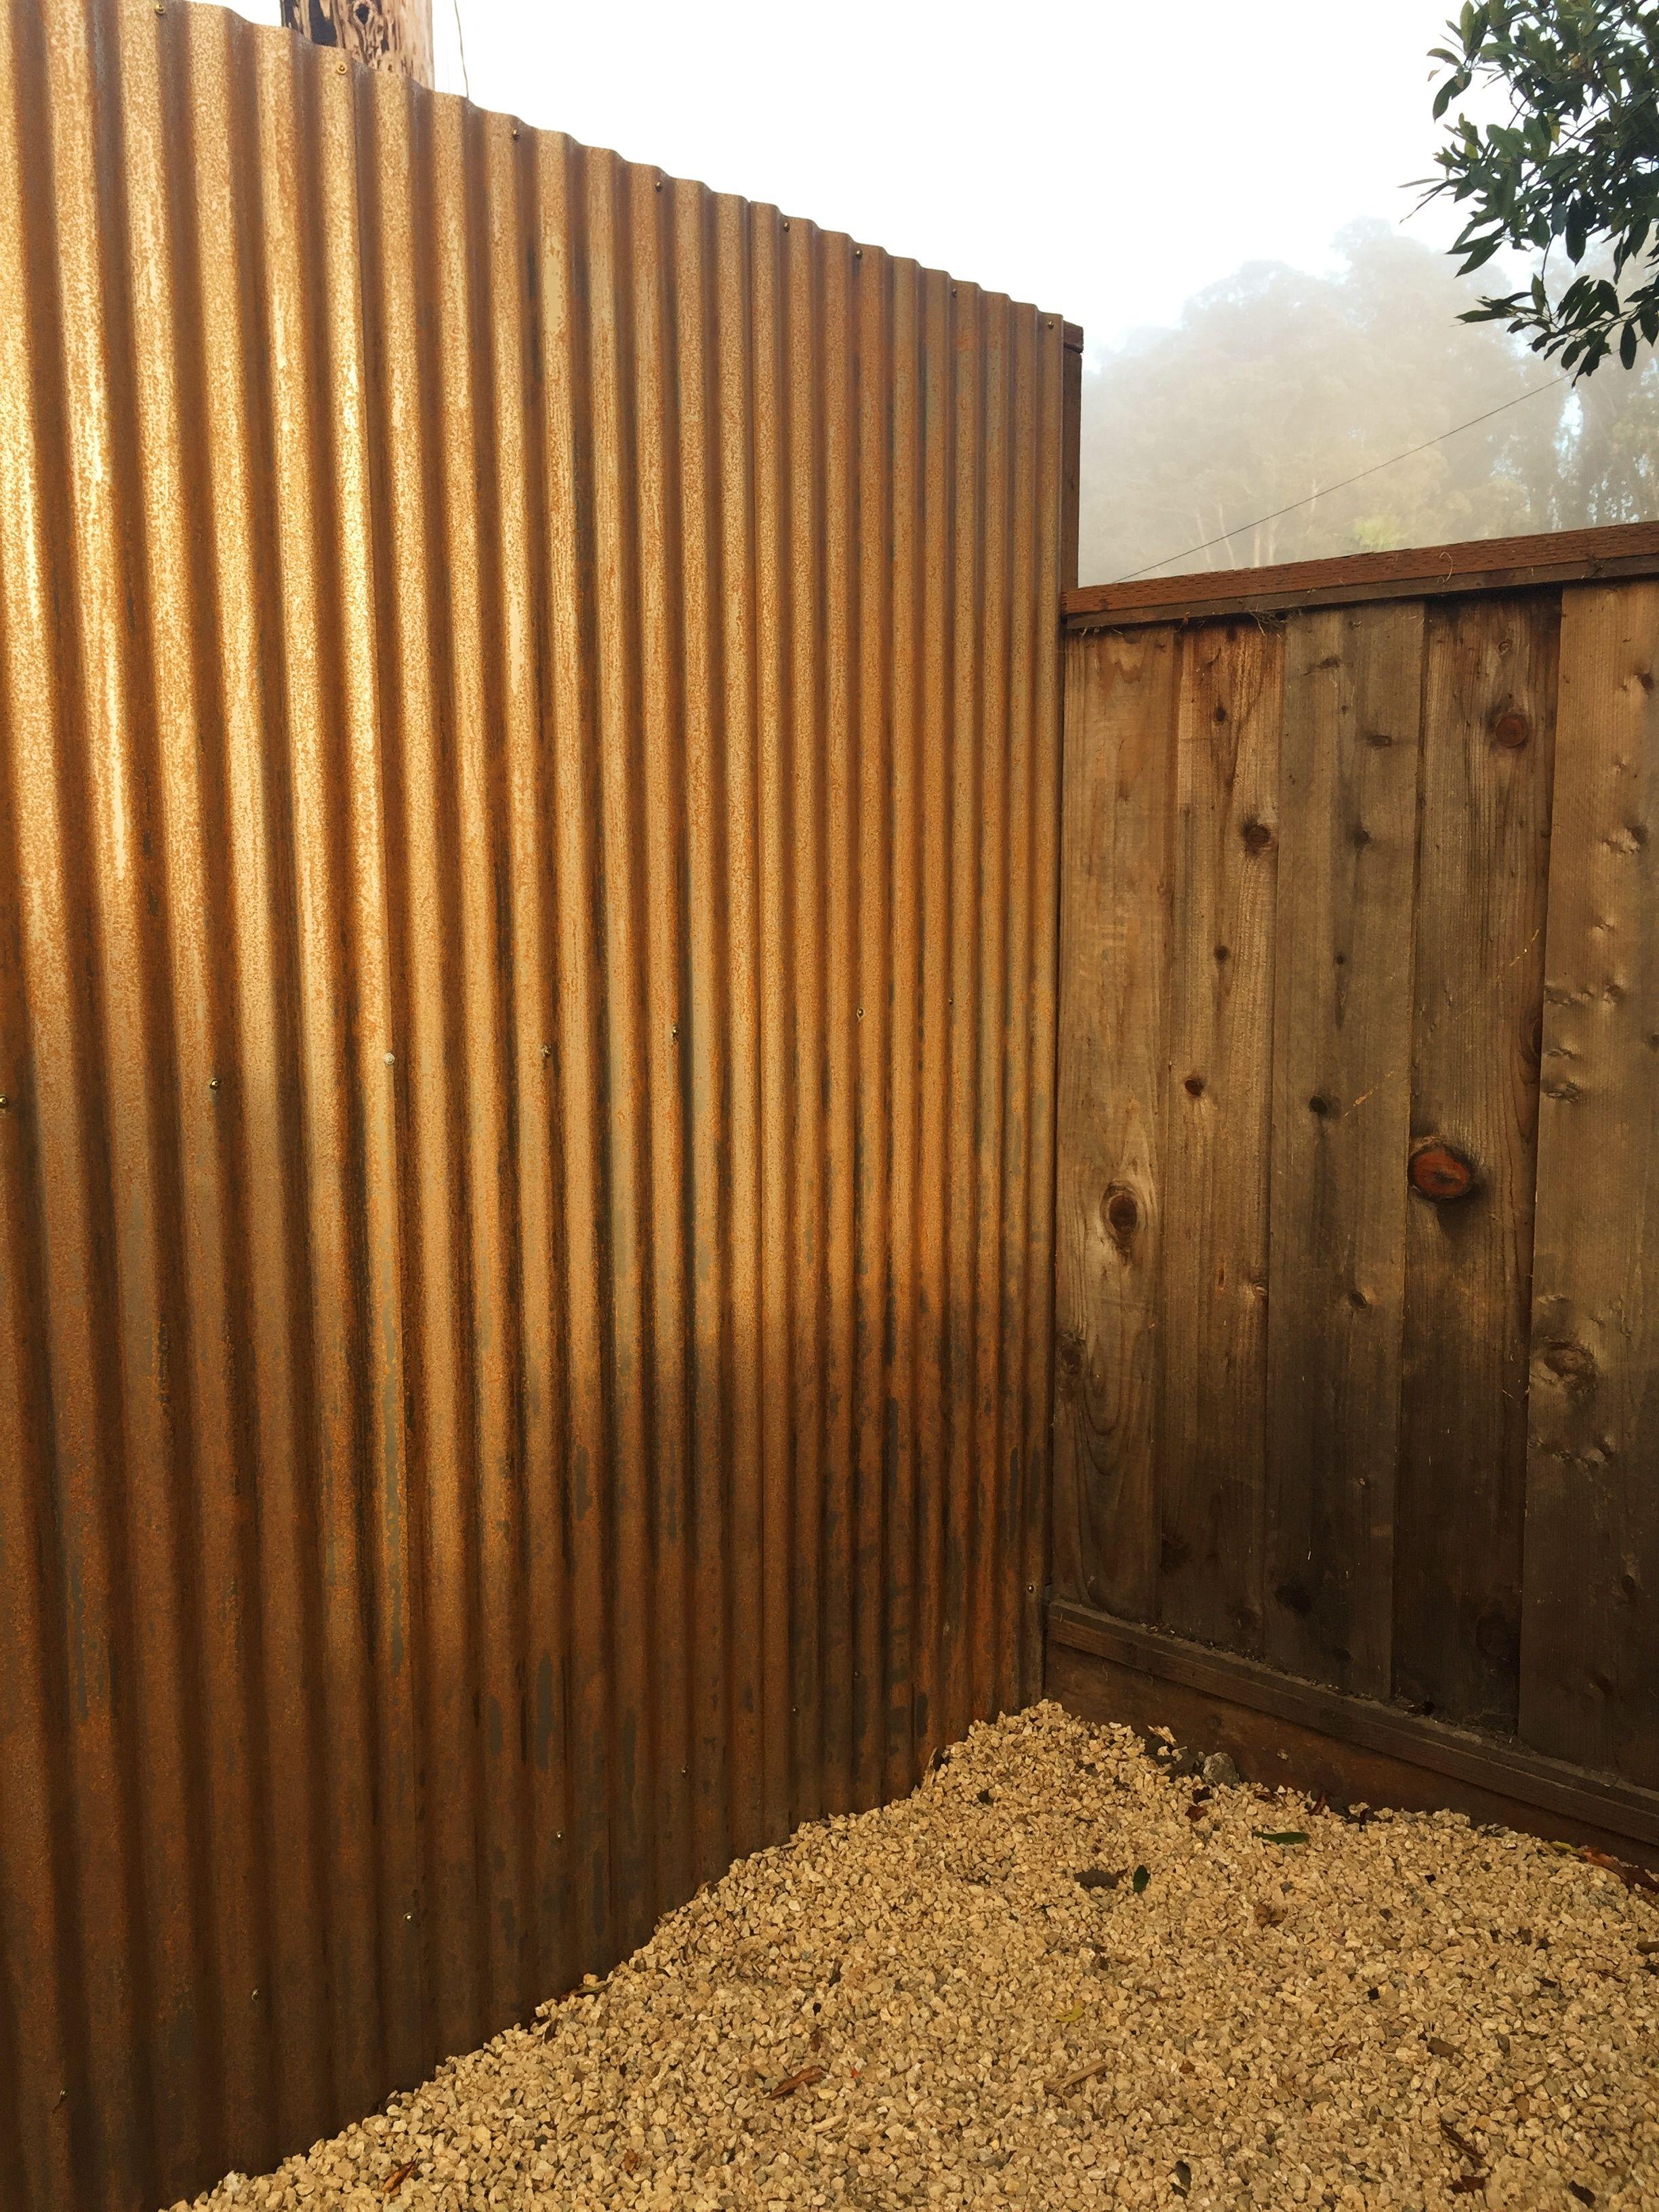 7 Cor Tin Rusting Metal Fence Interior Vallas